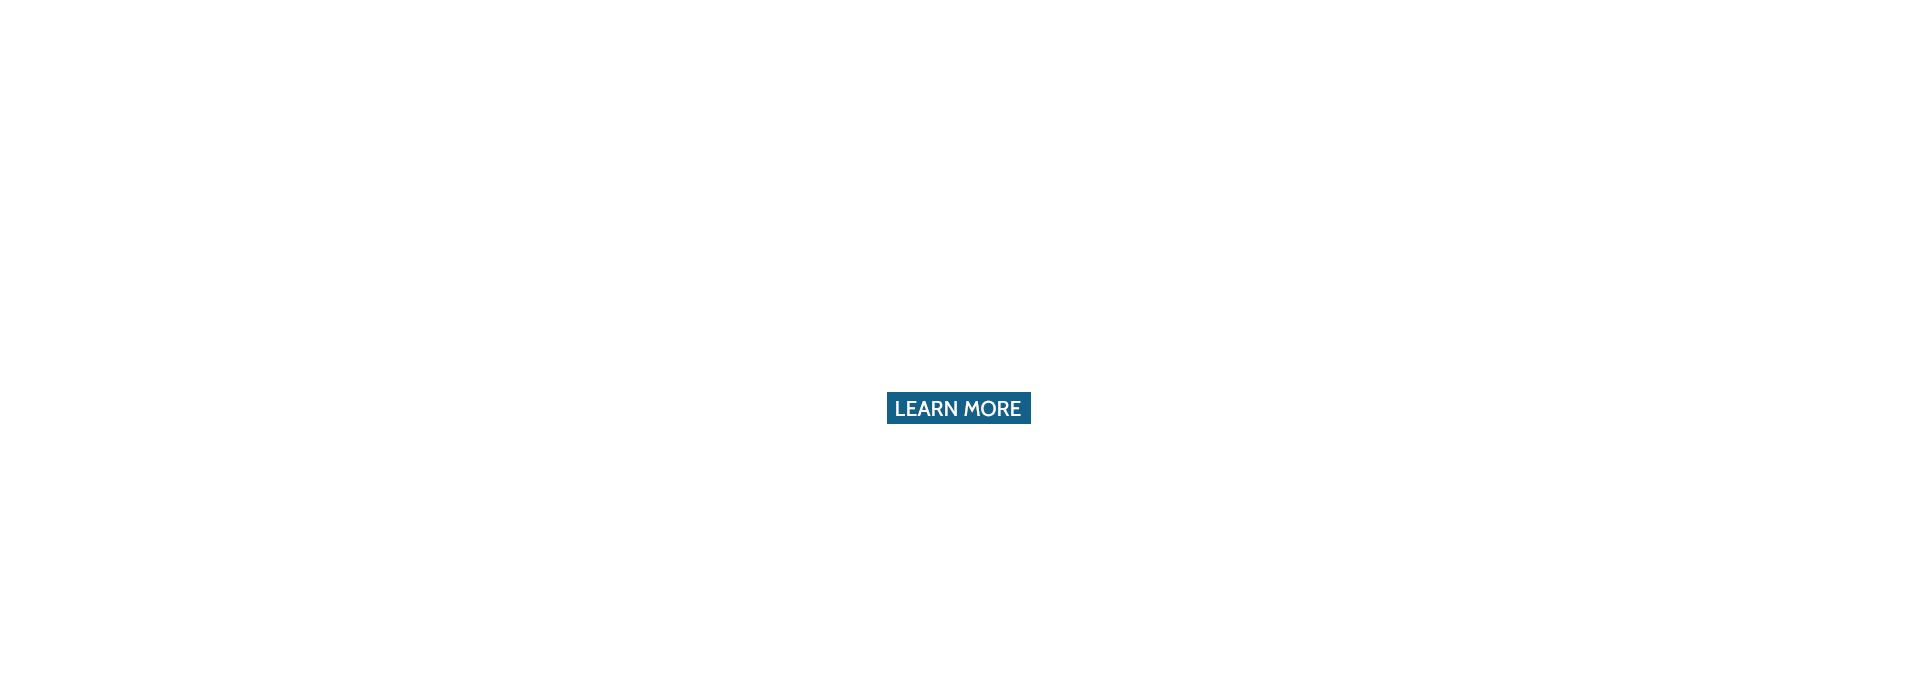 Vicktory Mondays